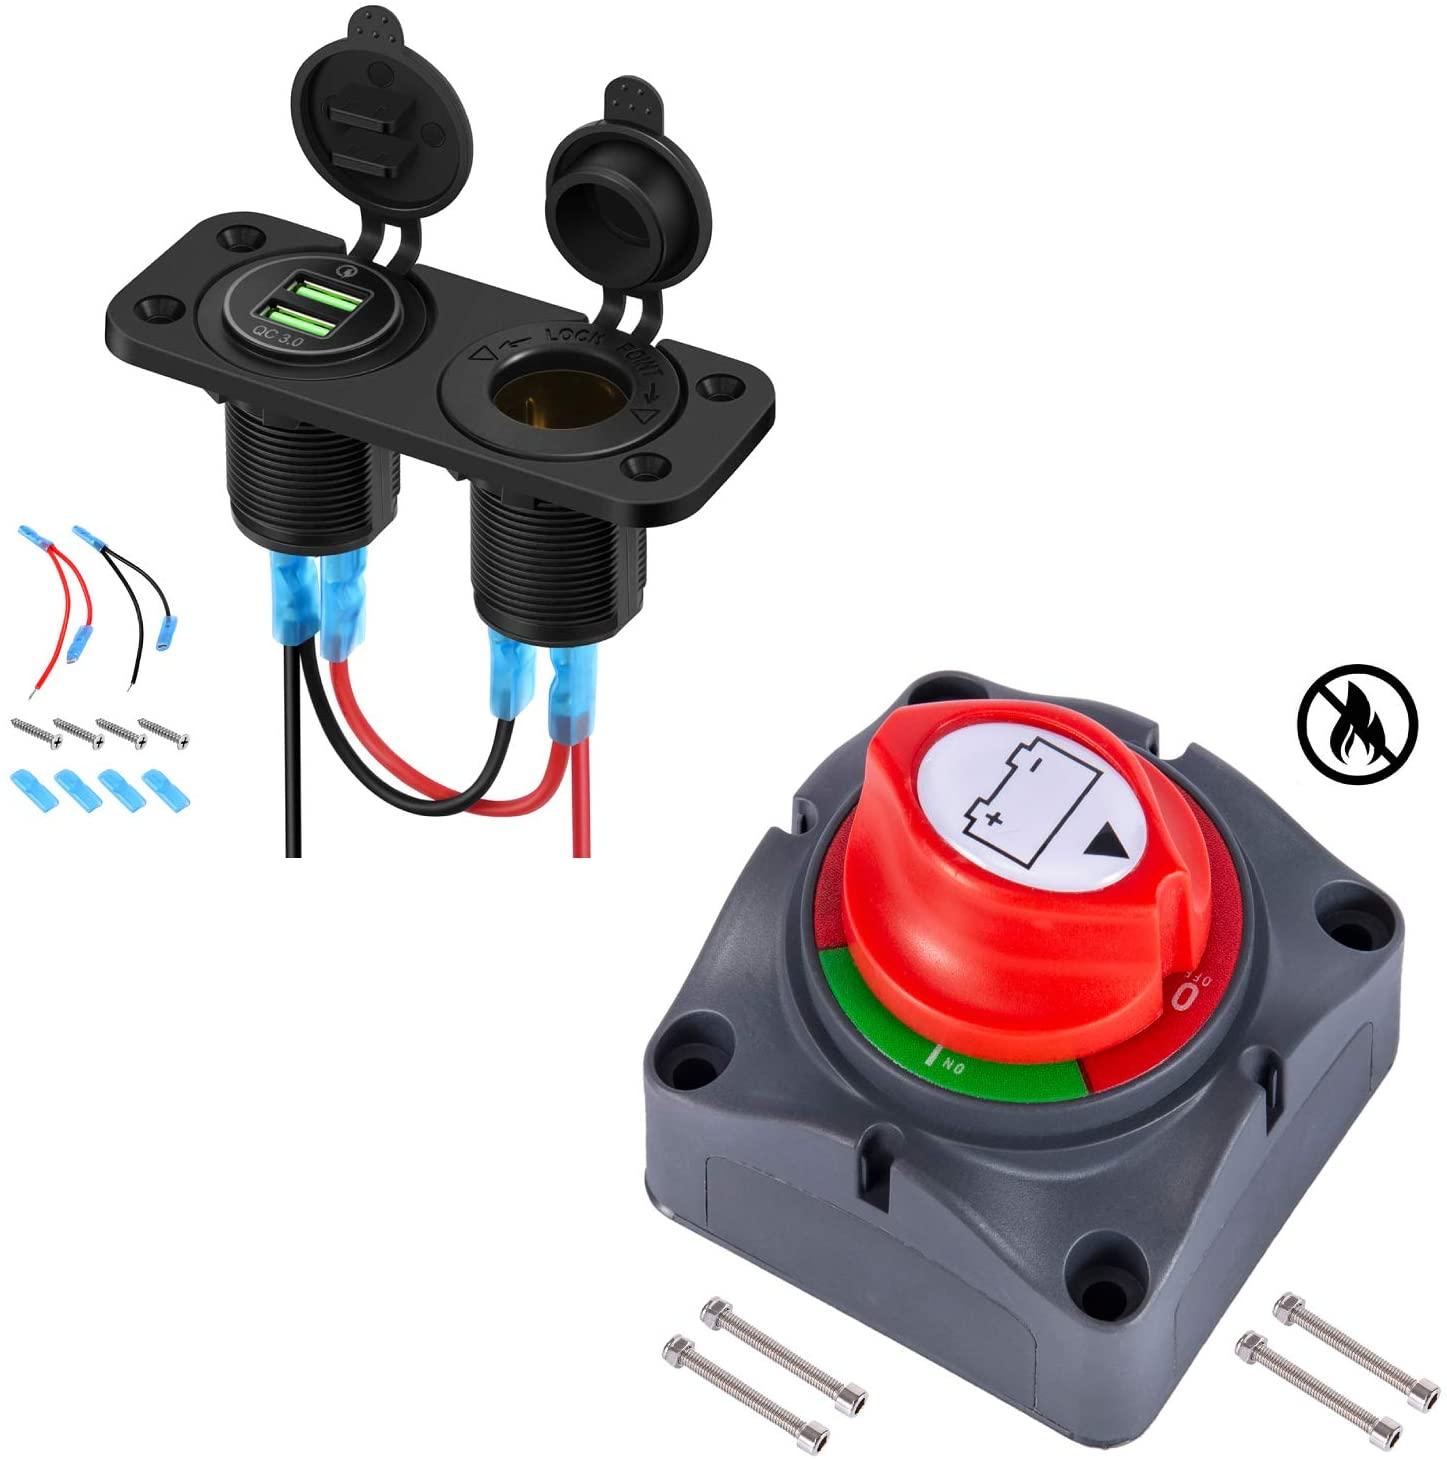 Bundle | Kohree Battery Disconnect Switch, 12V-48V Battery Isolator Power Cut Off Master Switch & 12V Cigarette Lighter Outlet Splitter, Quick Charge 3.0 Dual USB Ports LED Display